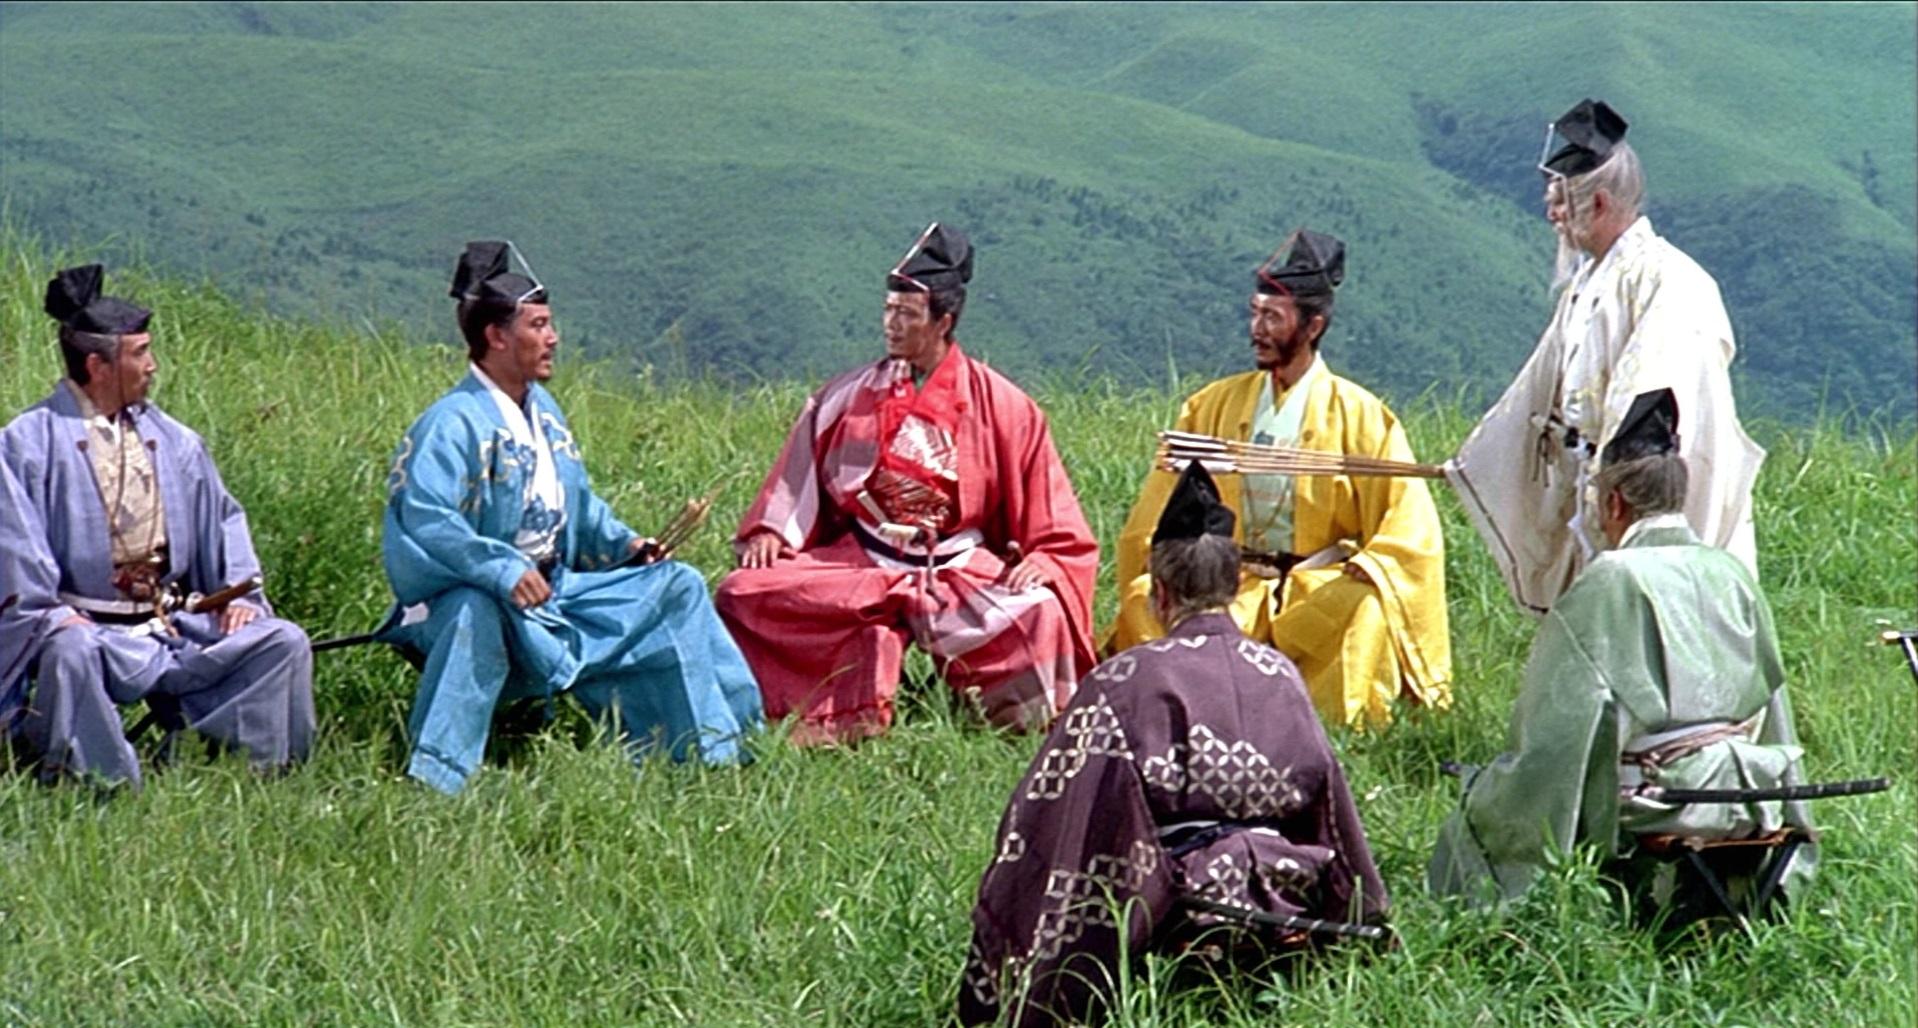 Shakespeare's Tragedy of King Lear to Kurosawa's Ran Essay